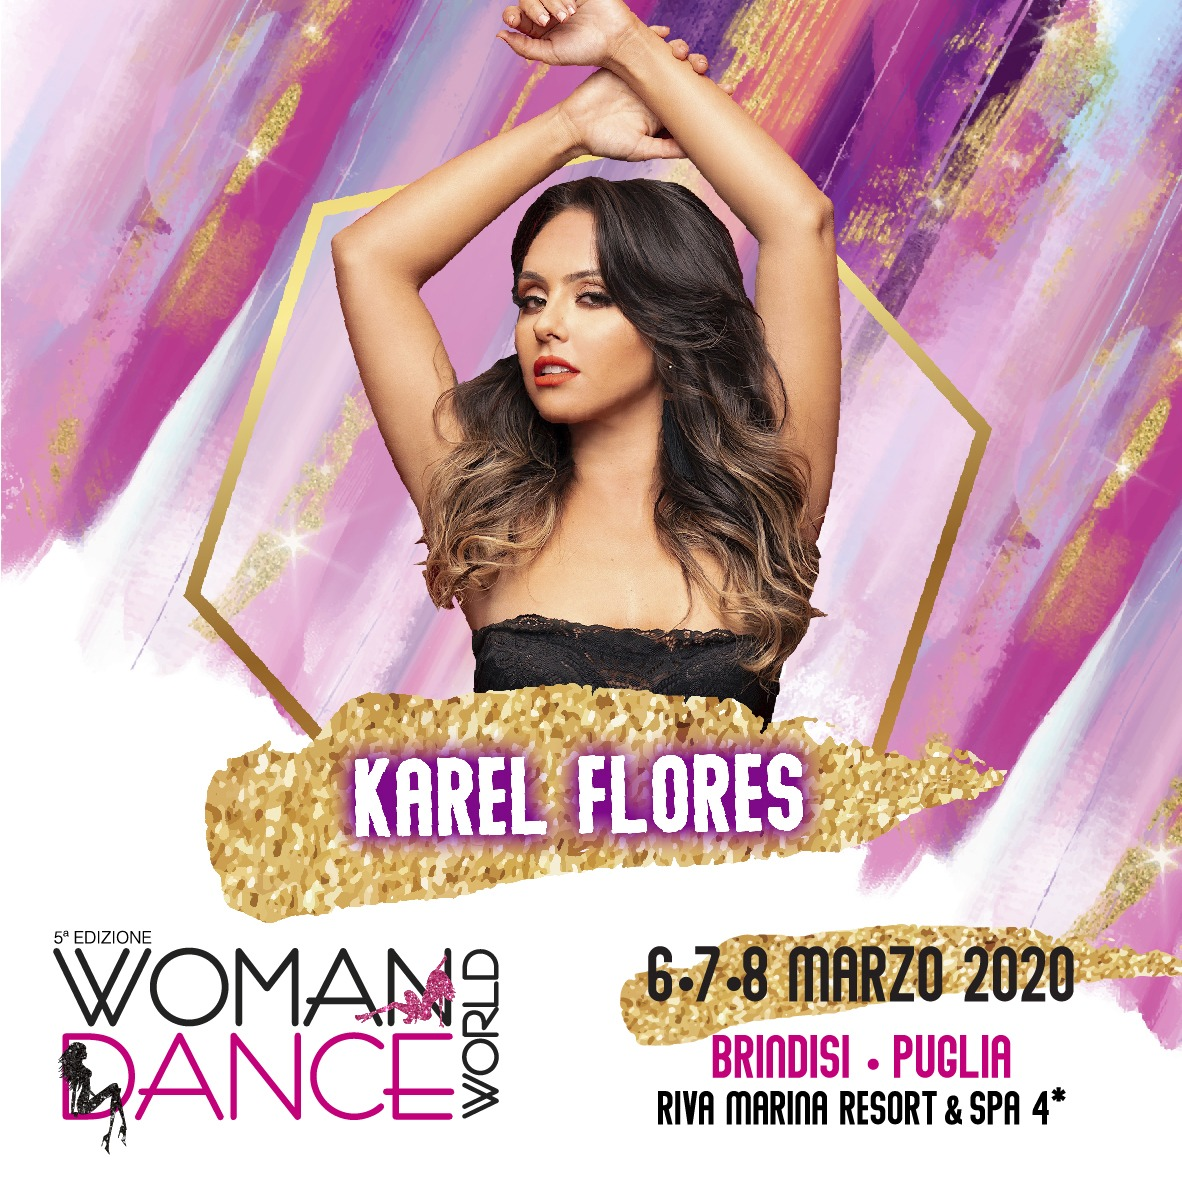 Karel Flores